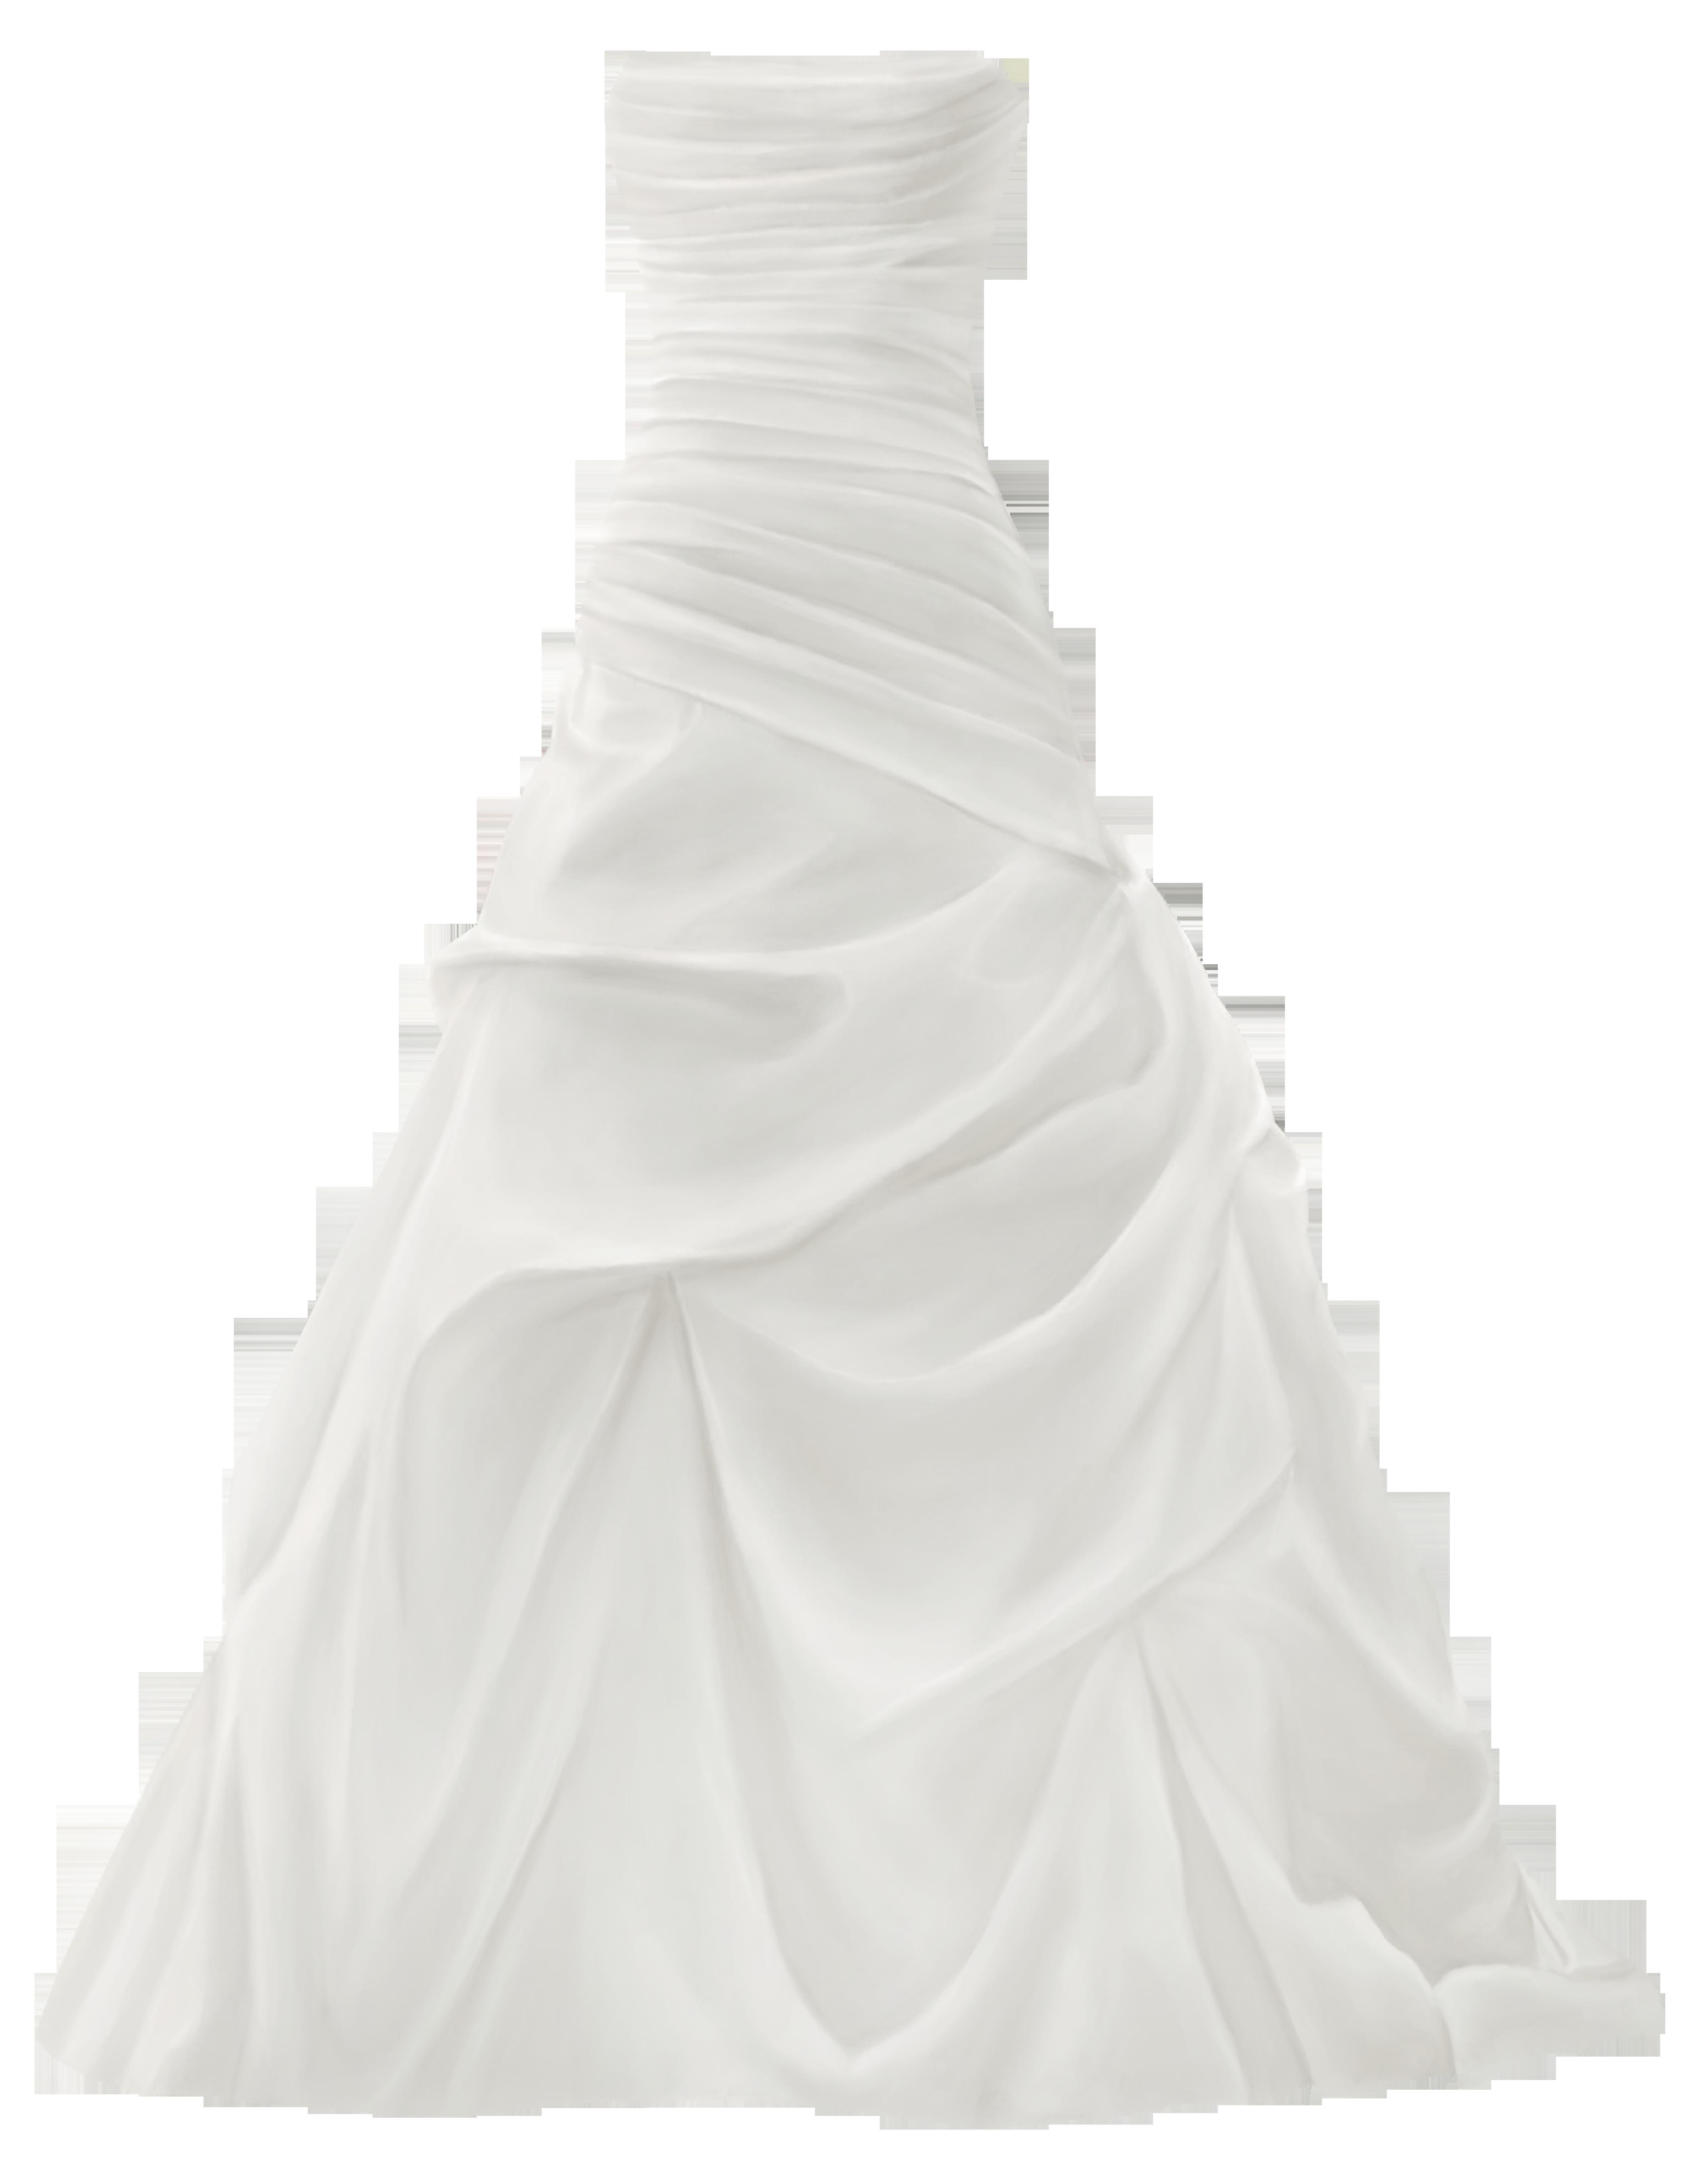 Clipart wedding shape. Dress silhouettes atdisability com